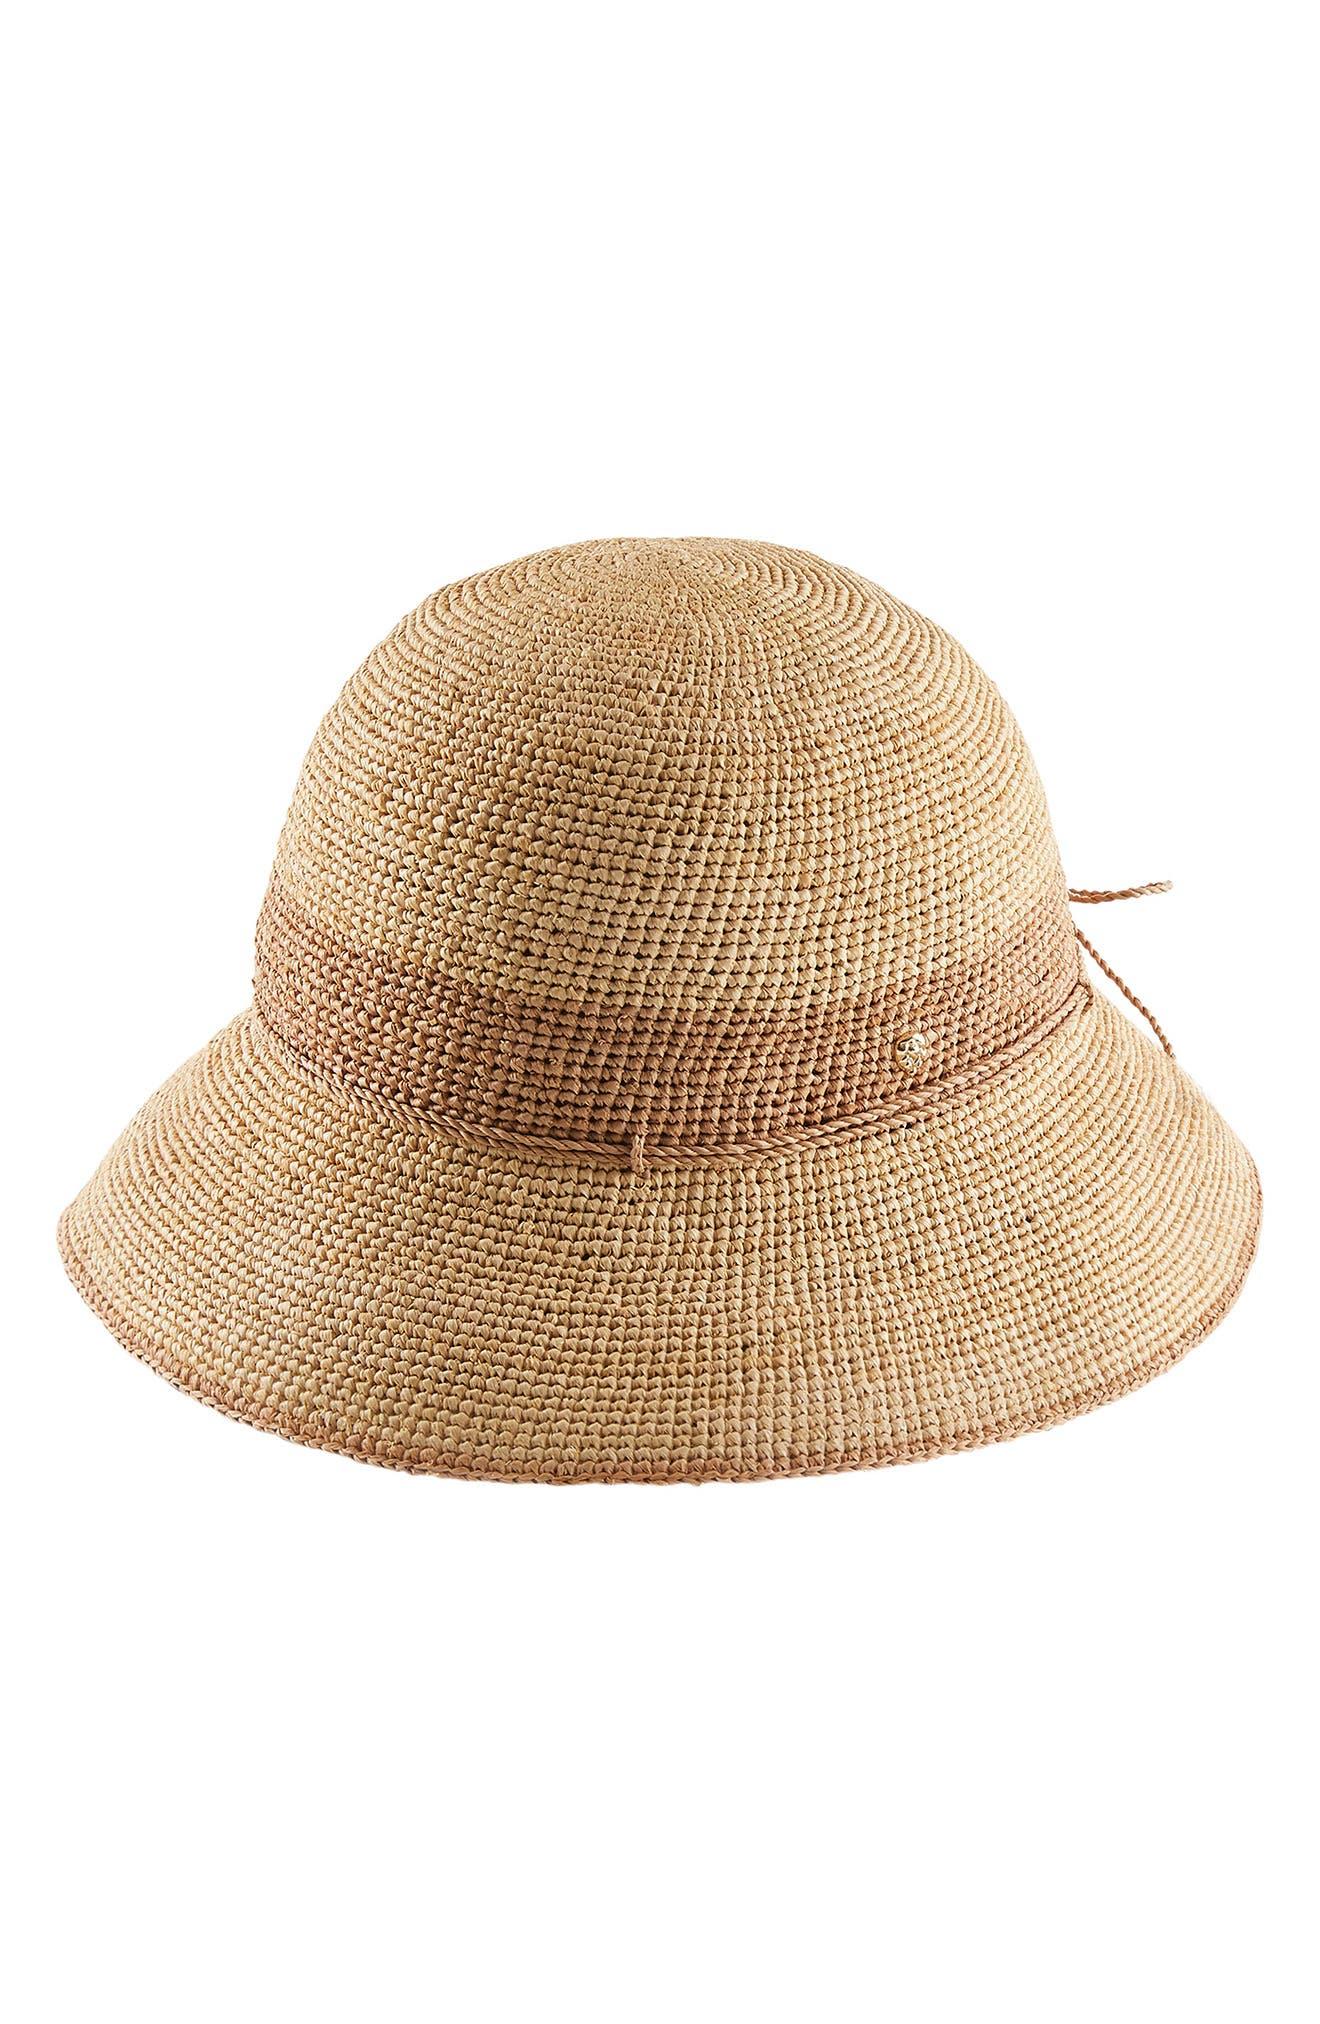 Amie 10 Crochet Raffia Hat